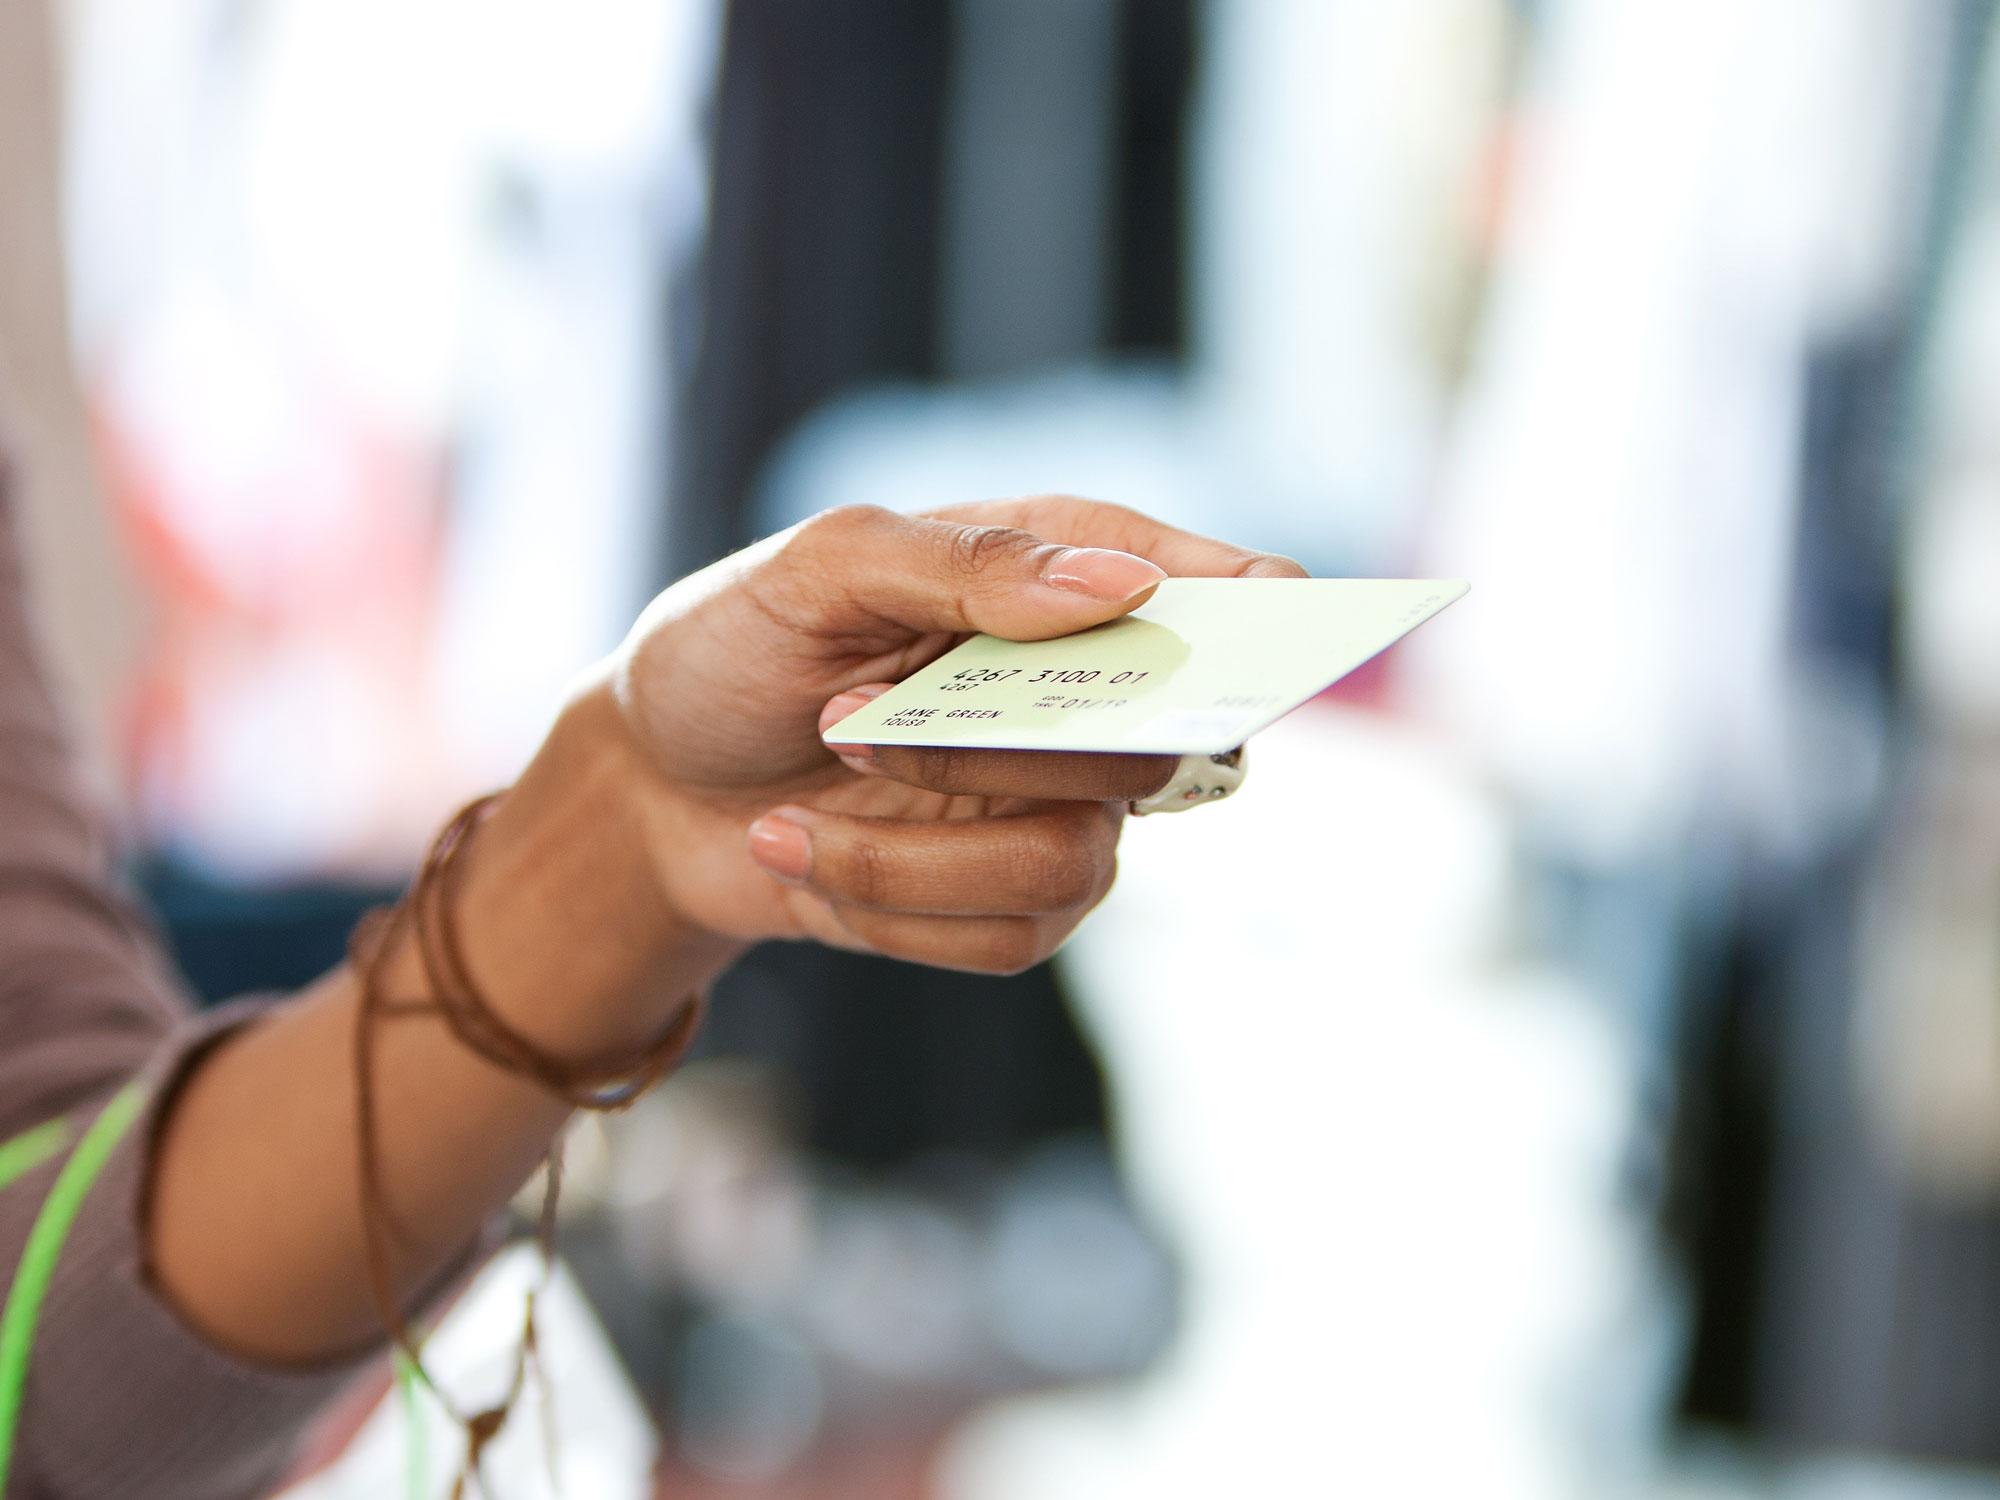 Handing over credit card